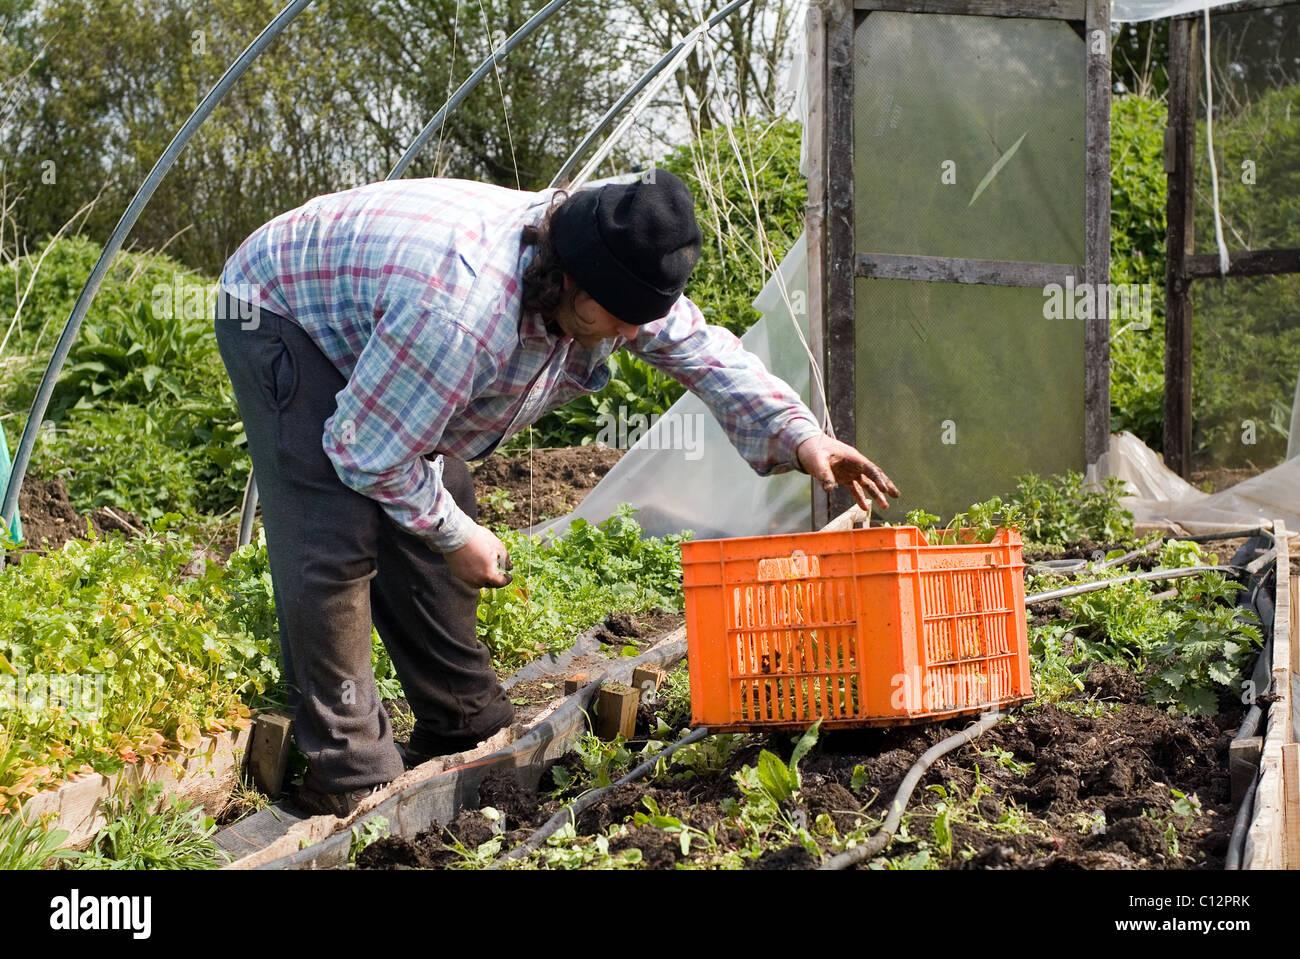 Gardening activity captured at Garden Organic, Ryton, Warwickshire, Uk - Stock Image